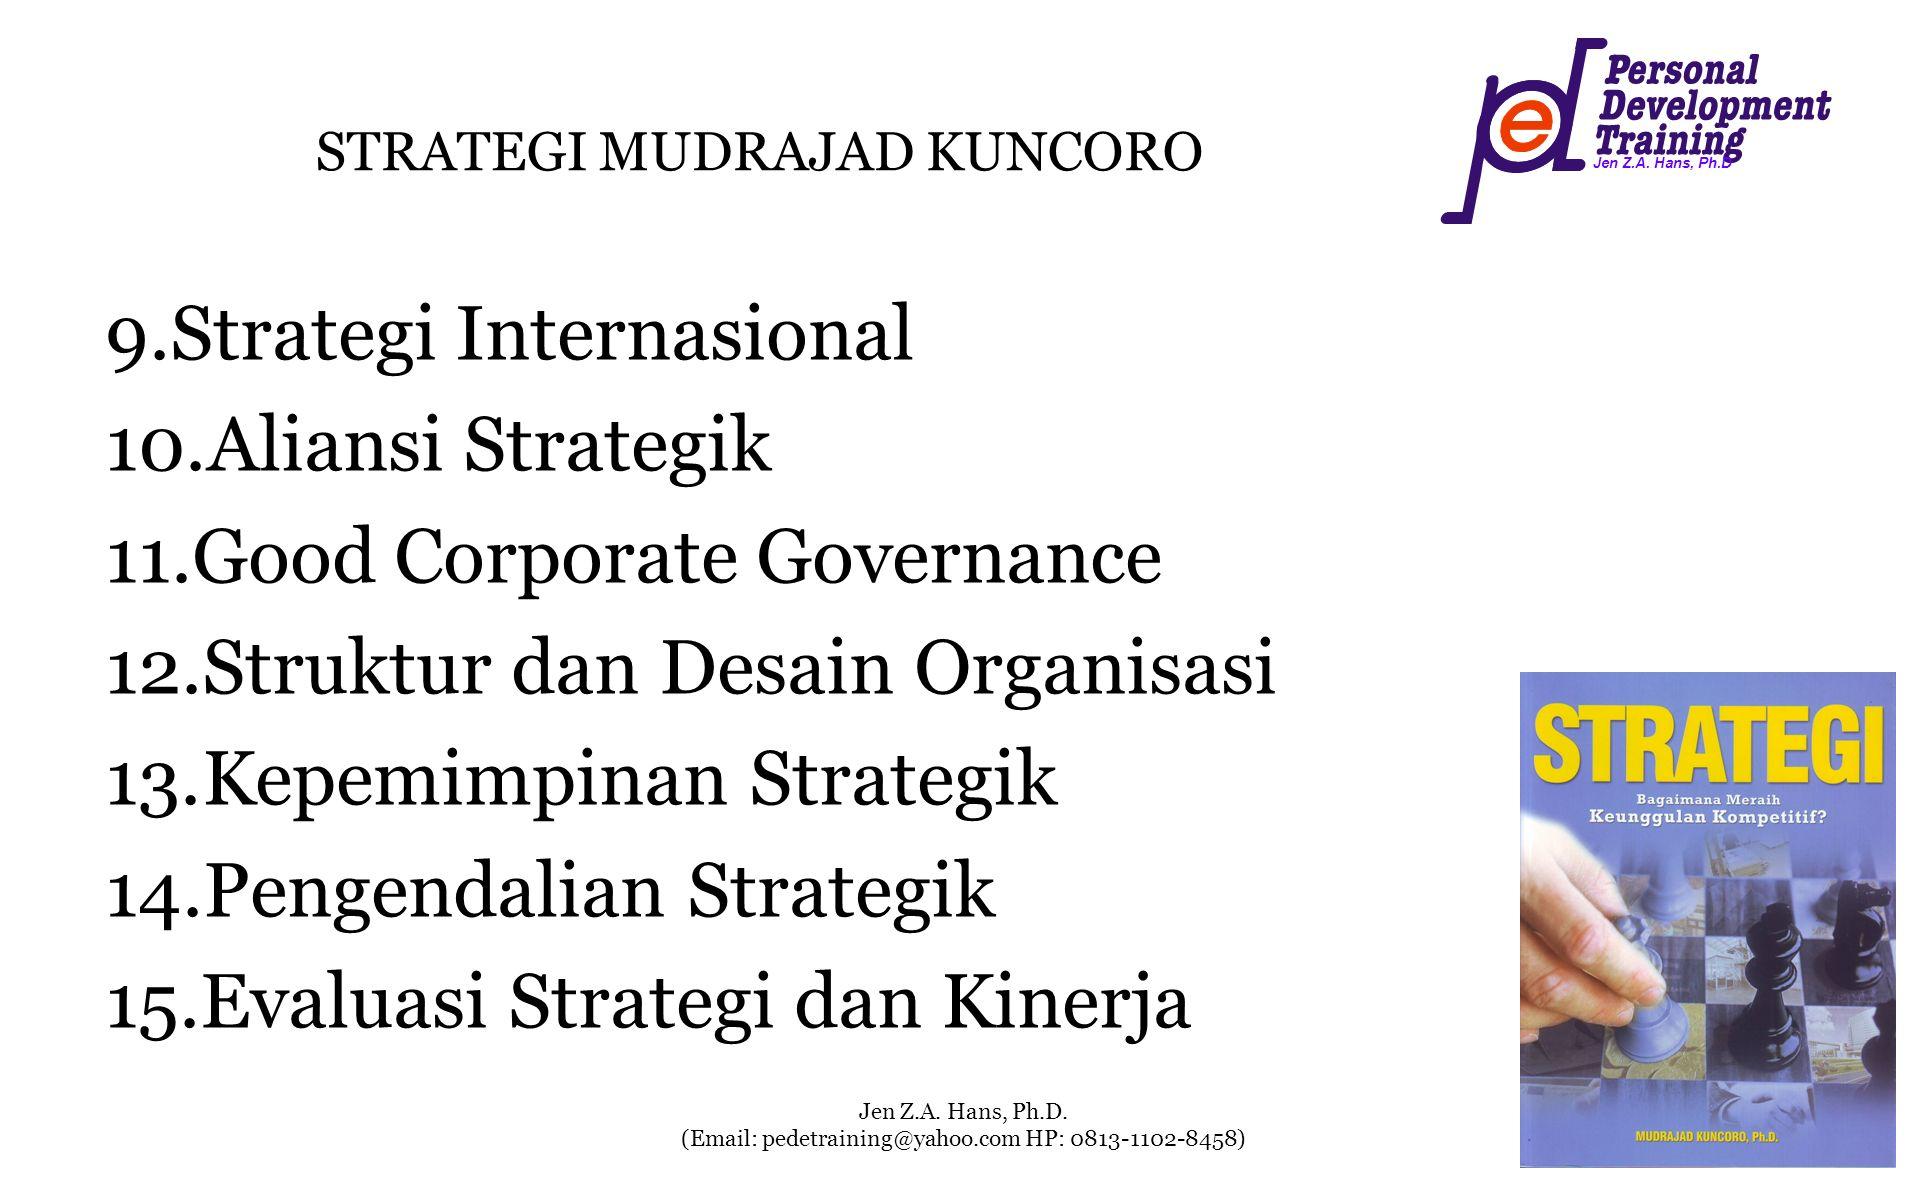 Jen Z.A. Hans, Ph.D Jen Z.A. Hans, Ph.D. (Email: pedetraining@yahoo.com HP: 0813-1102-8458) STRATEGI MUDRAJAD KUNCORO 9.Strategi Internasional 10.Alia